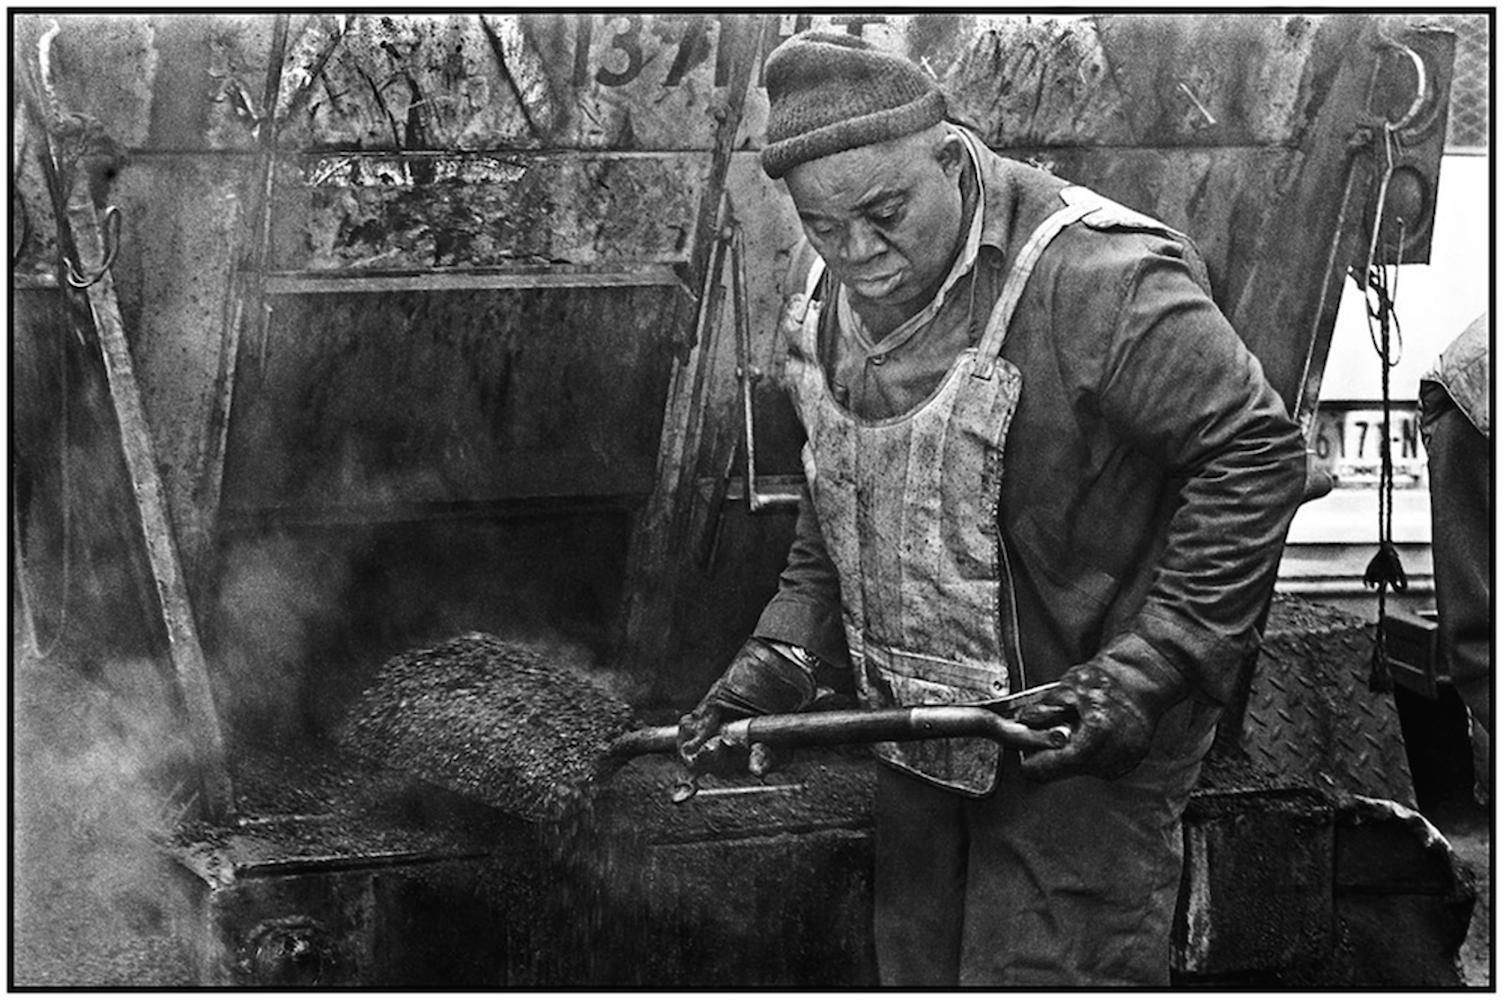 Highway Repairer Chester Bailey shovels hot asphalt to fill pothole in midtown Manhattan. 1984.